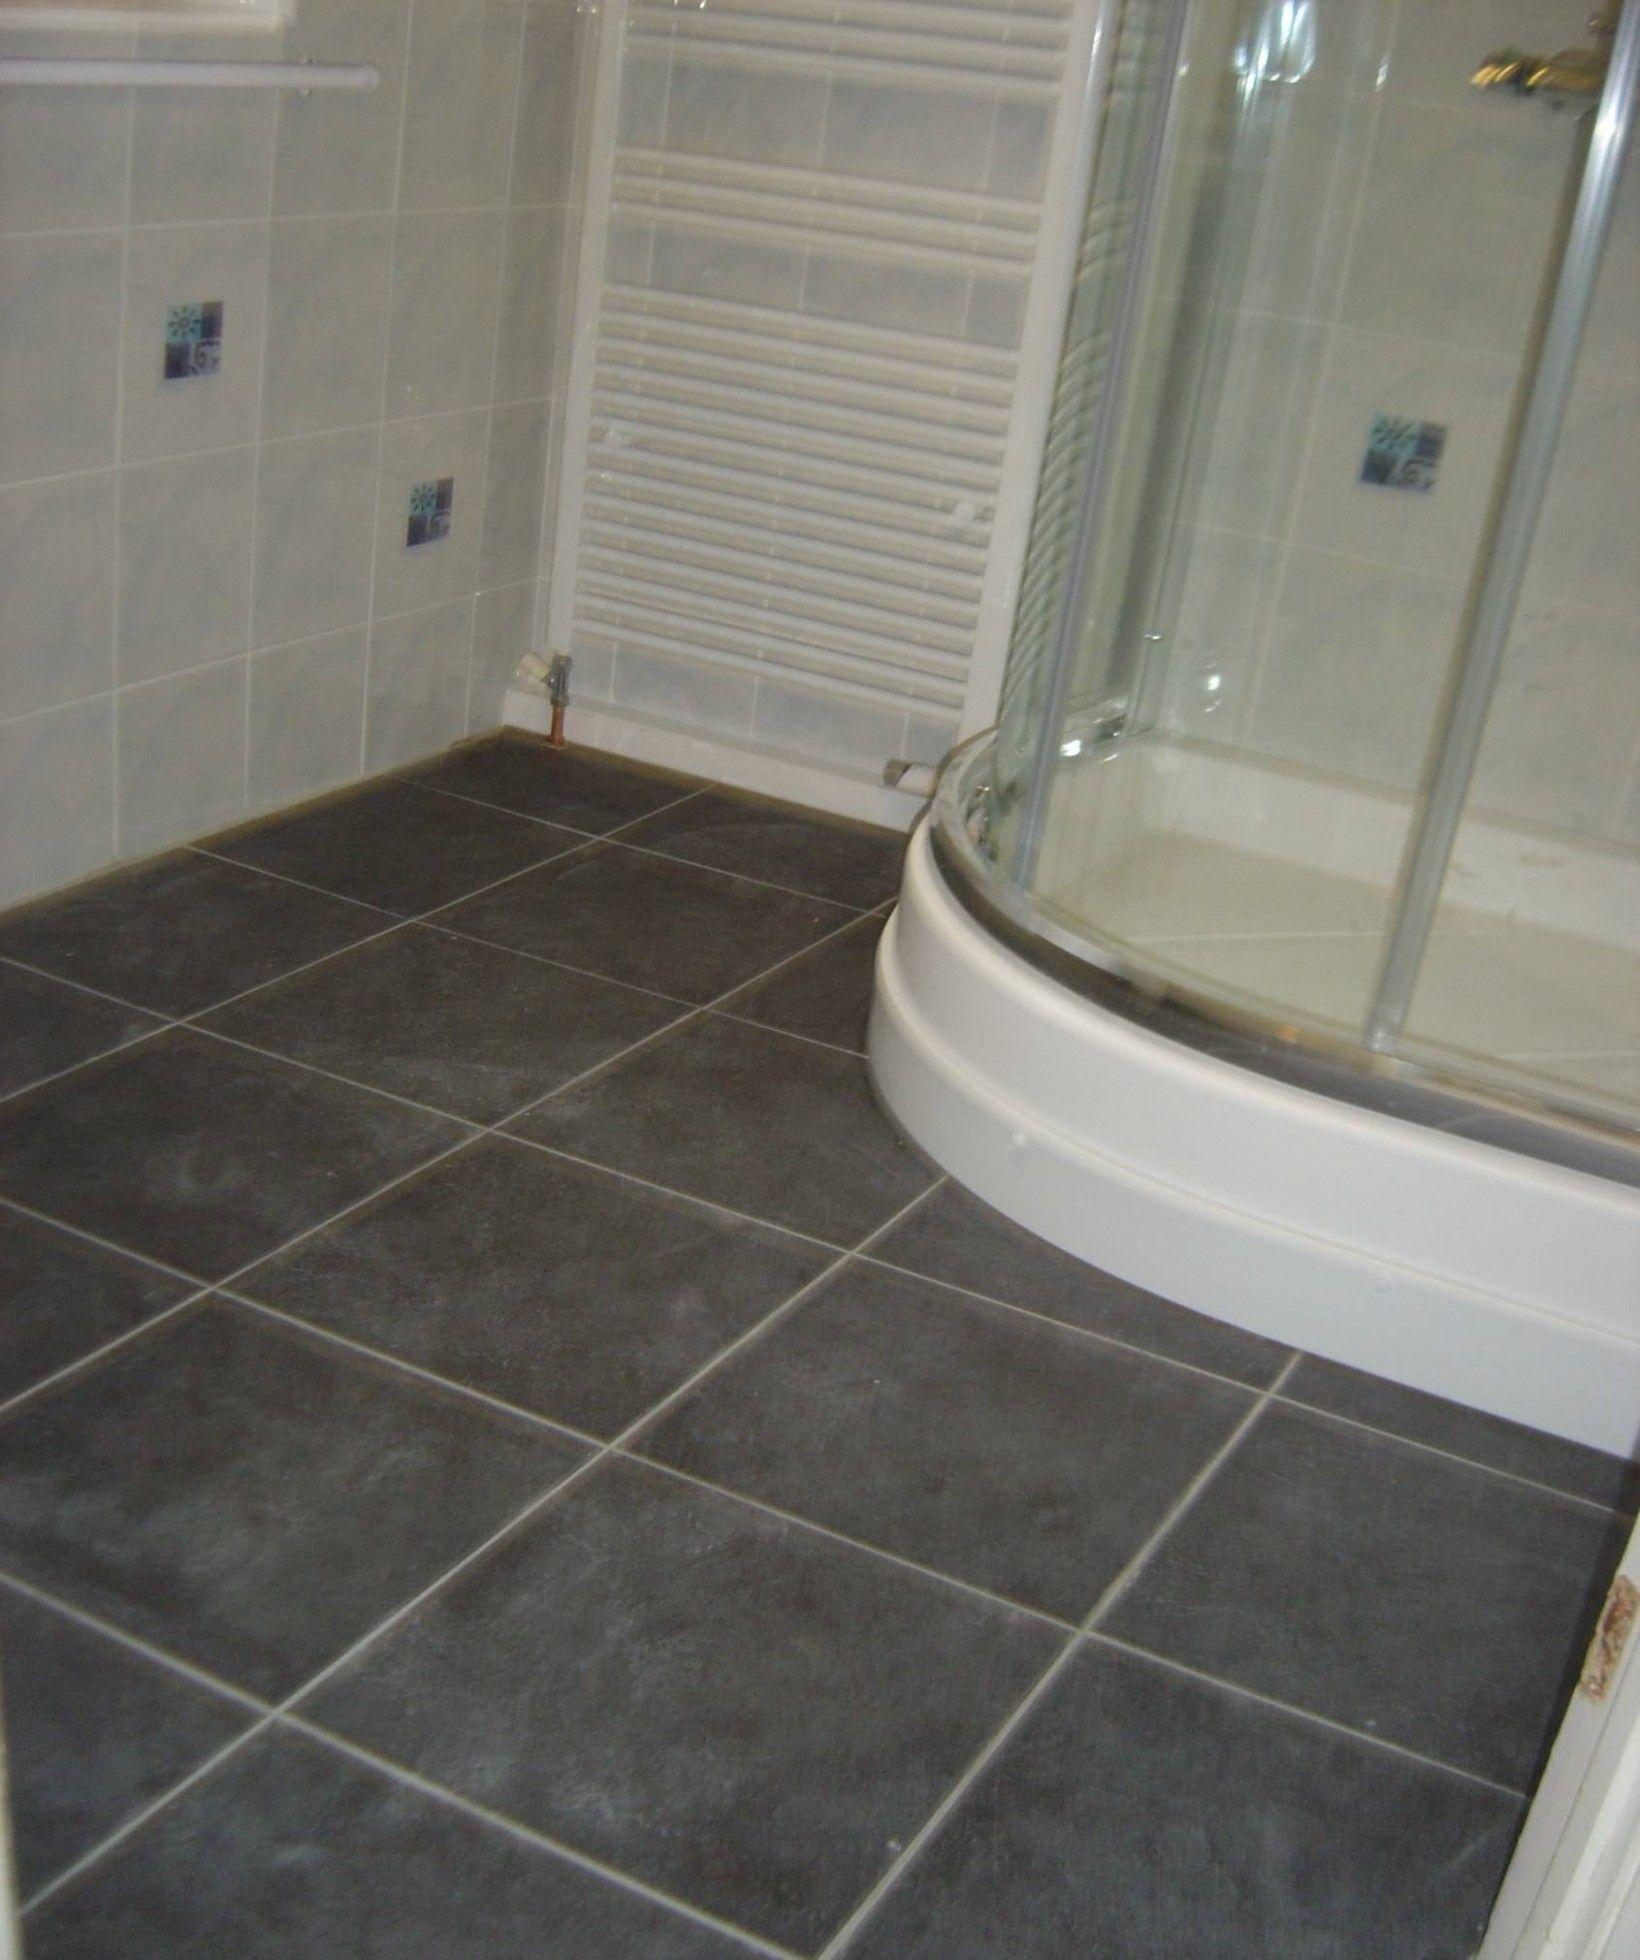 Home Depot Bathroom Floor Tiles Ideas di 2020